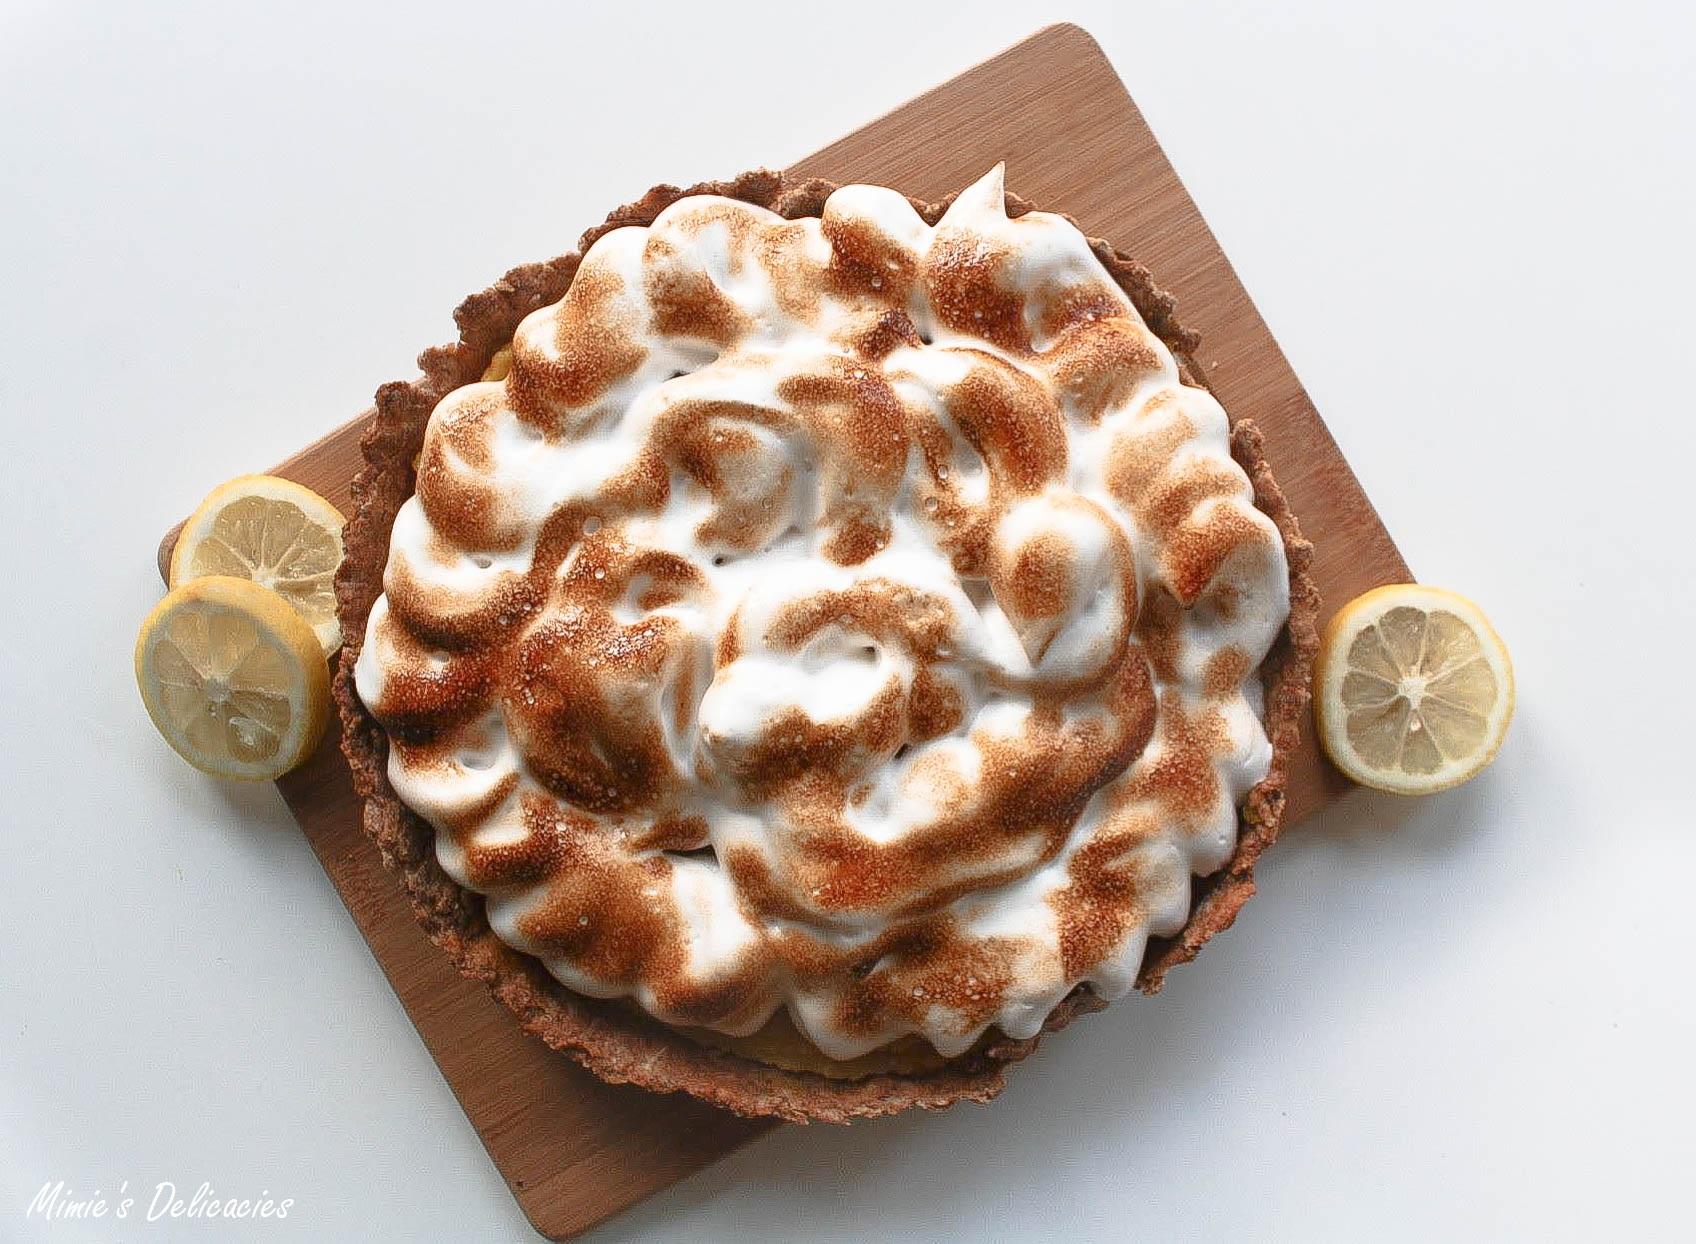 Tarte au citron meringu e facile vegan sans gluten - Tarte au citron meringuee facile ...